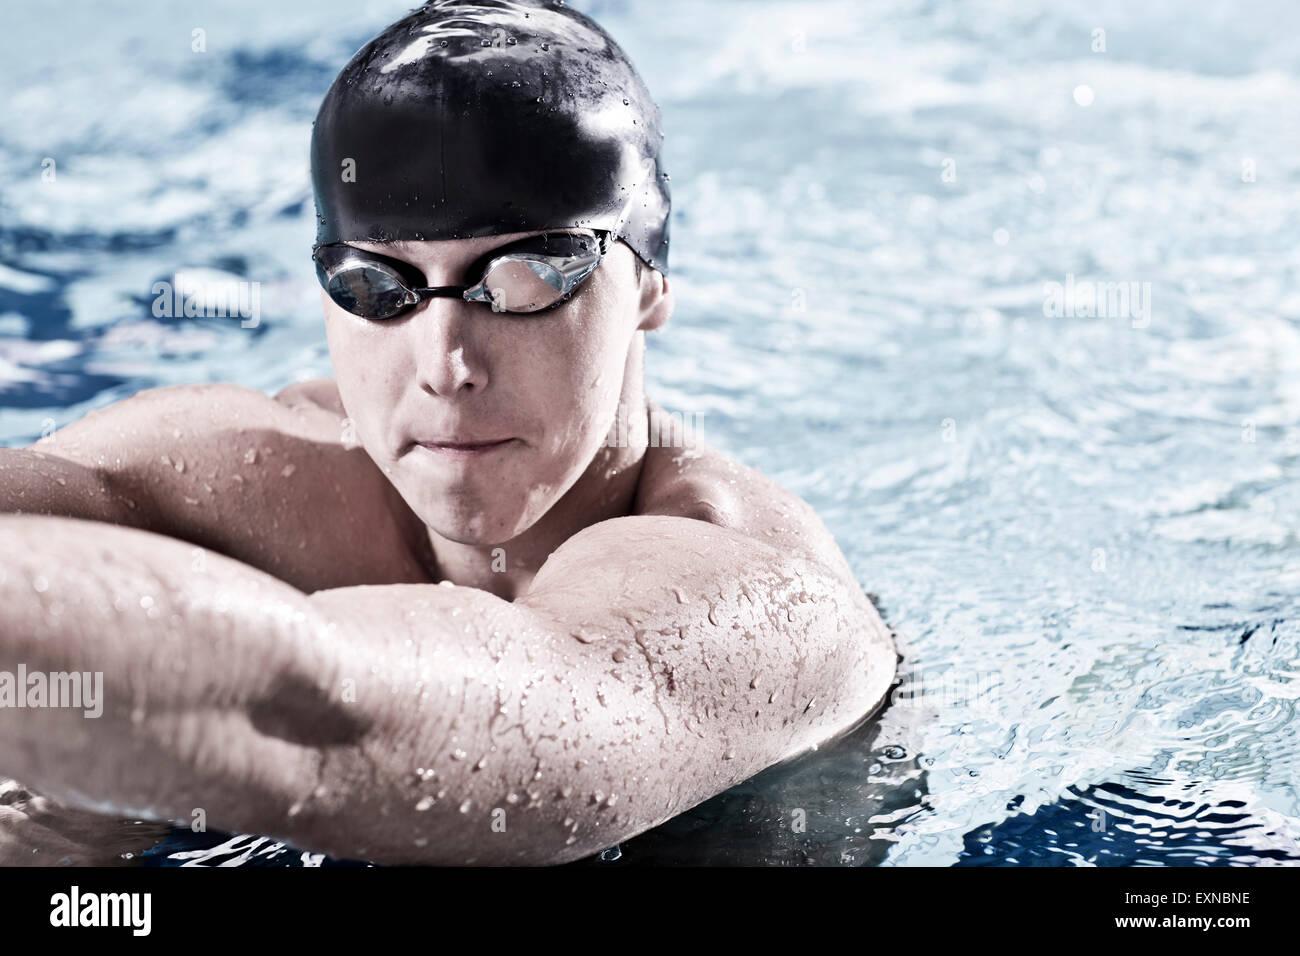 Nuotatore in piscina interna Immagini Stock